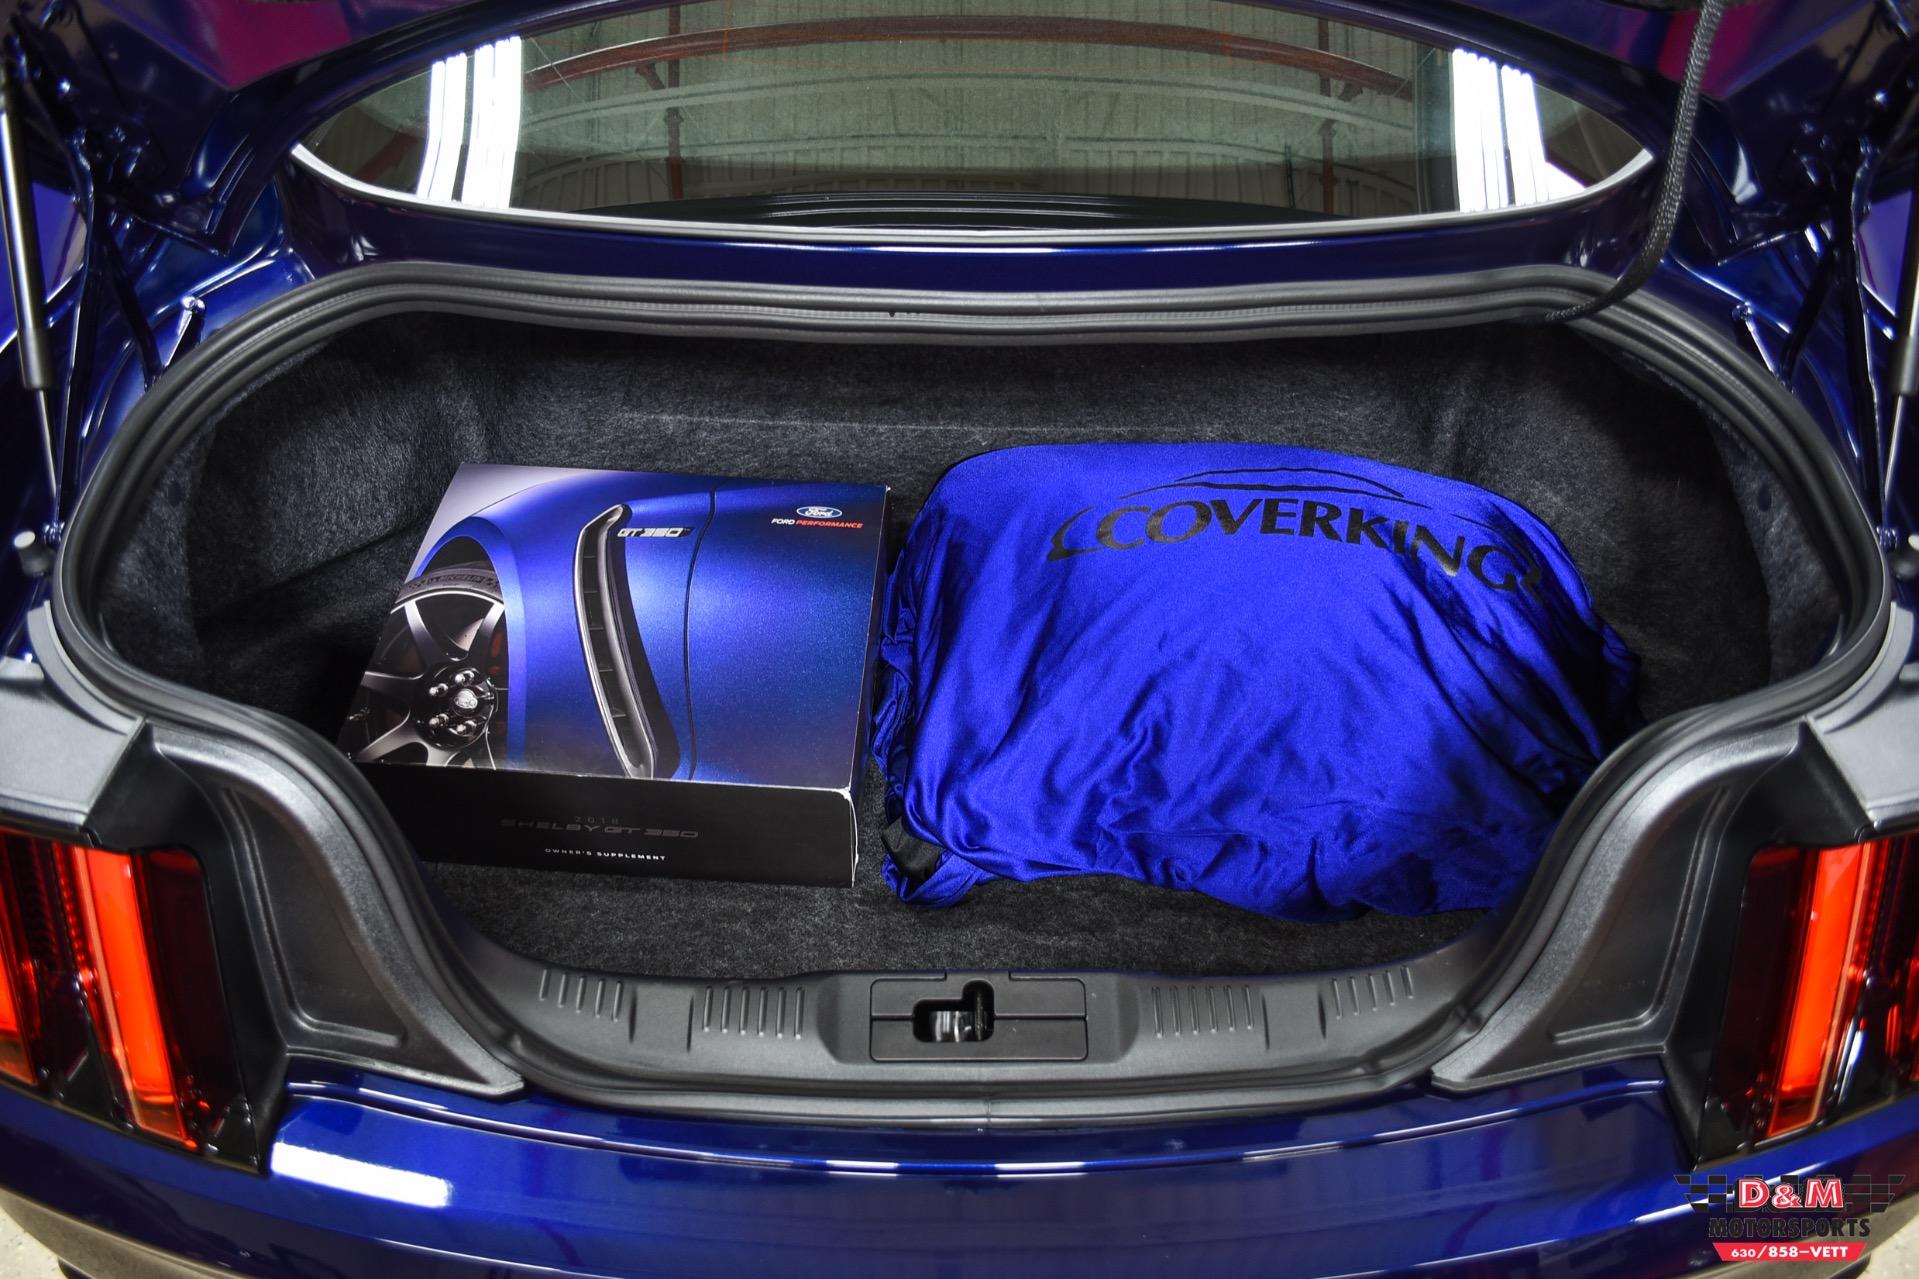 Used 2018 Ford Mustang Shelby GT350   Glen Ellyn, IL